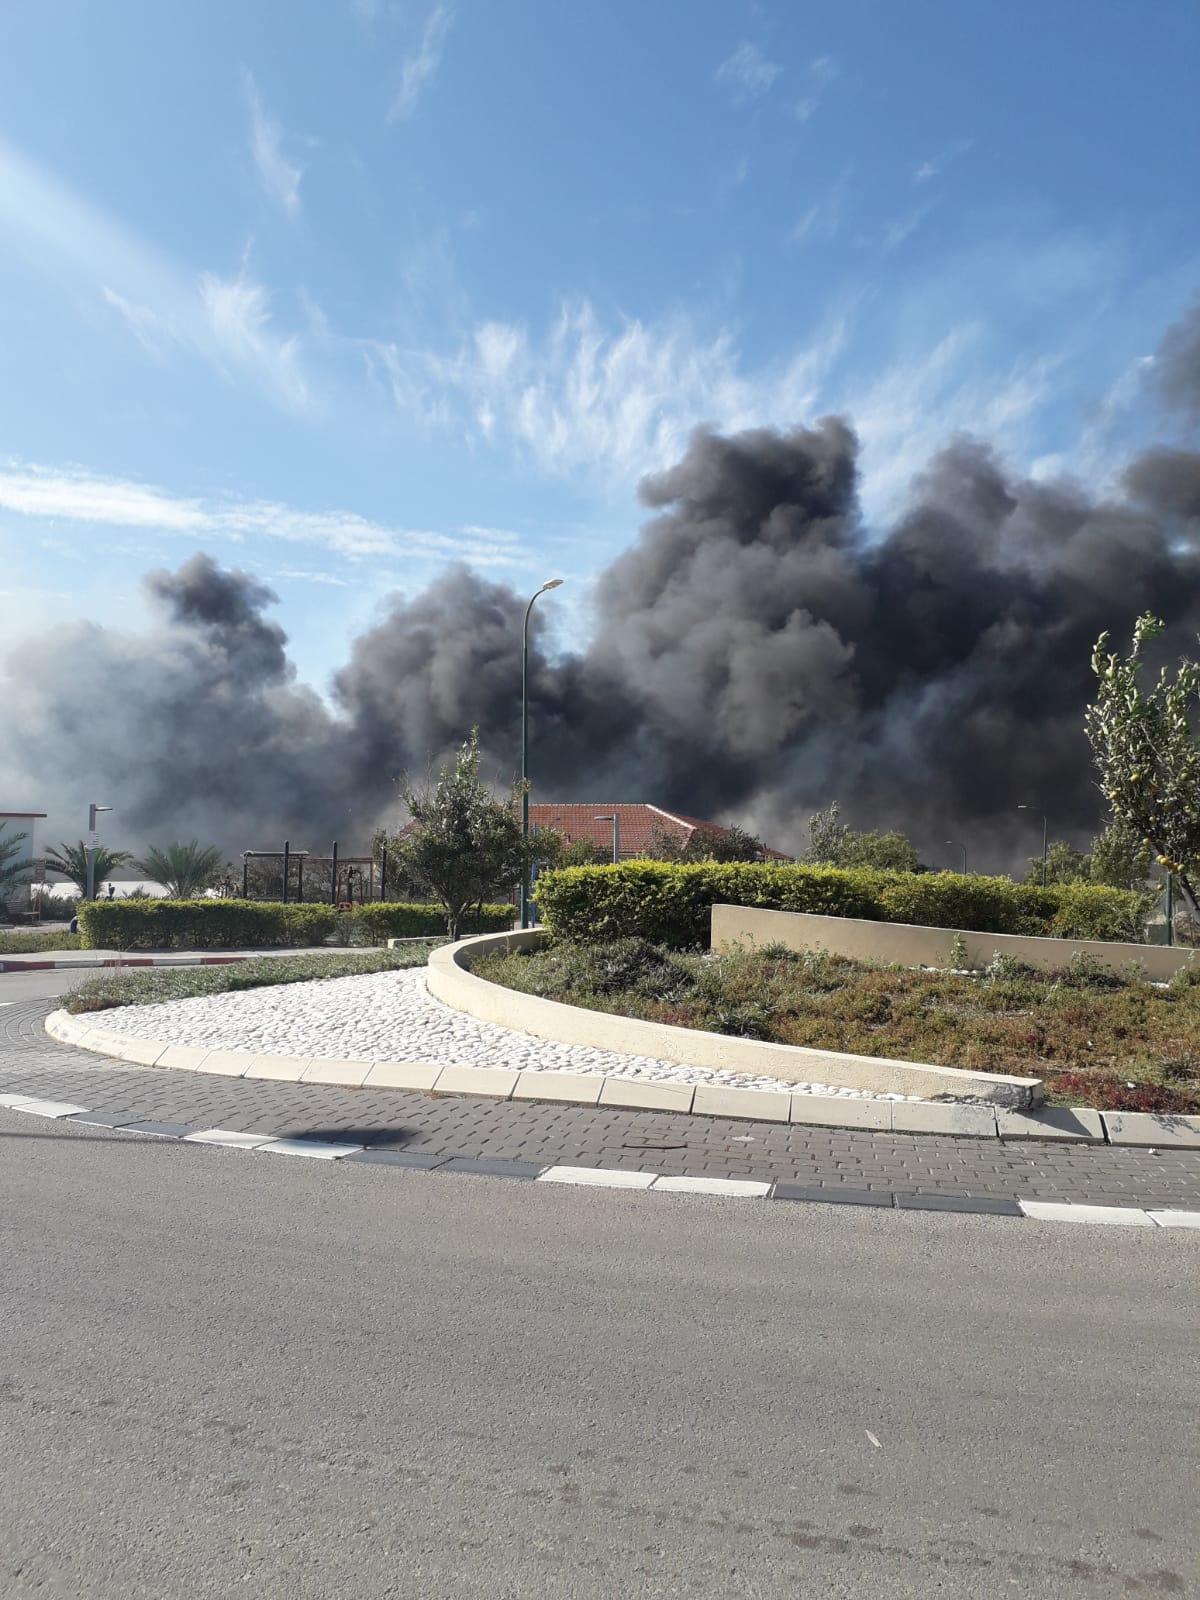 Photo of שריפות משתוללות במספר מוקדים מהיישוב יסודות ועד לוד ונתניה. עשרות צוותי כיבוי ומטוסים הוזנקו